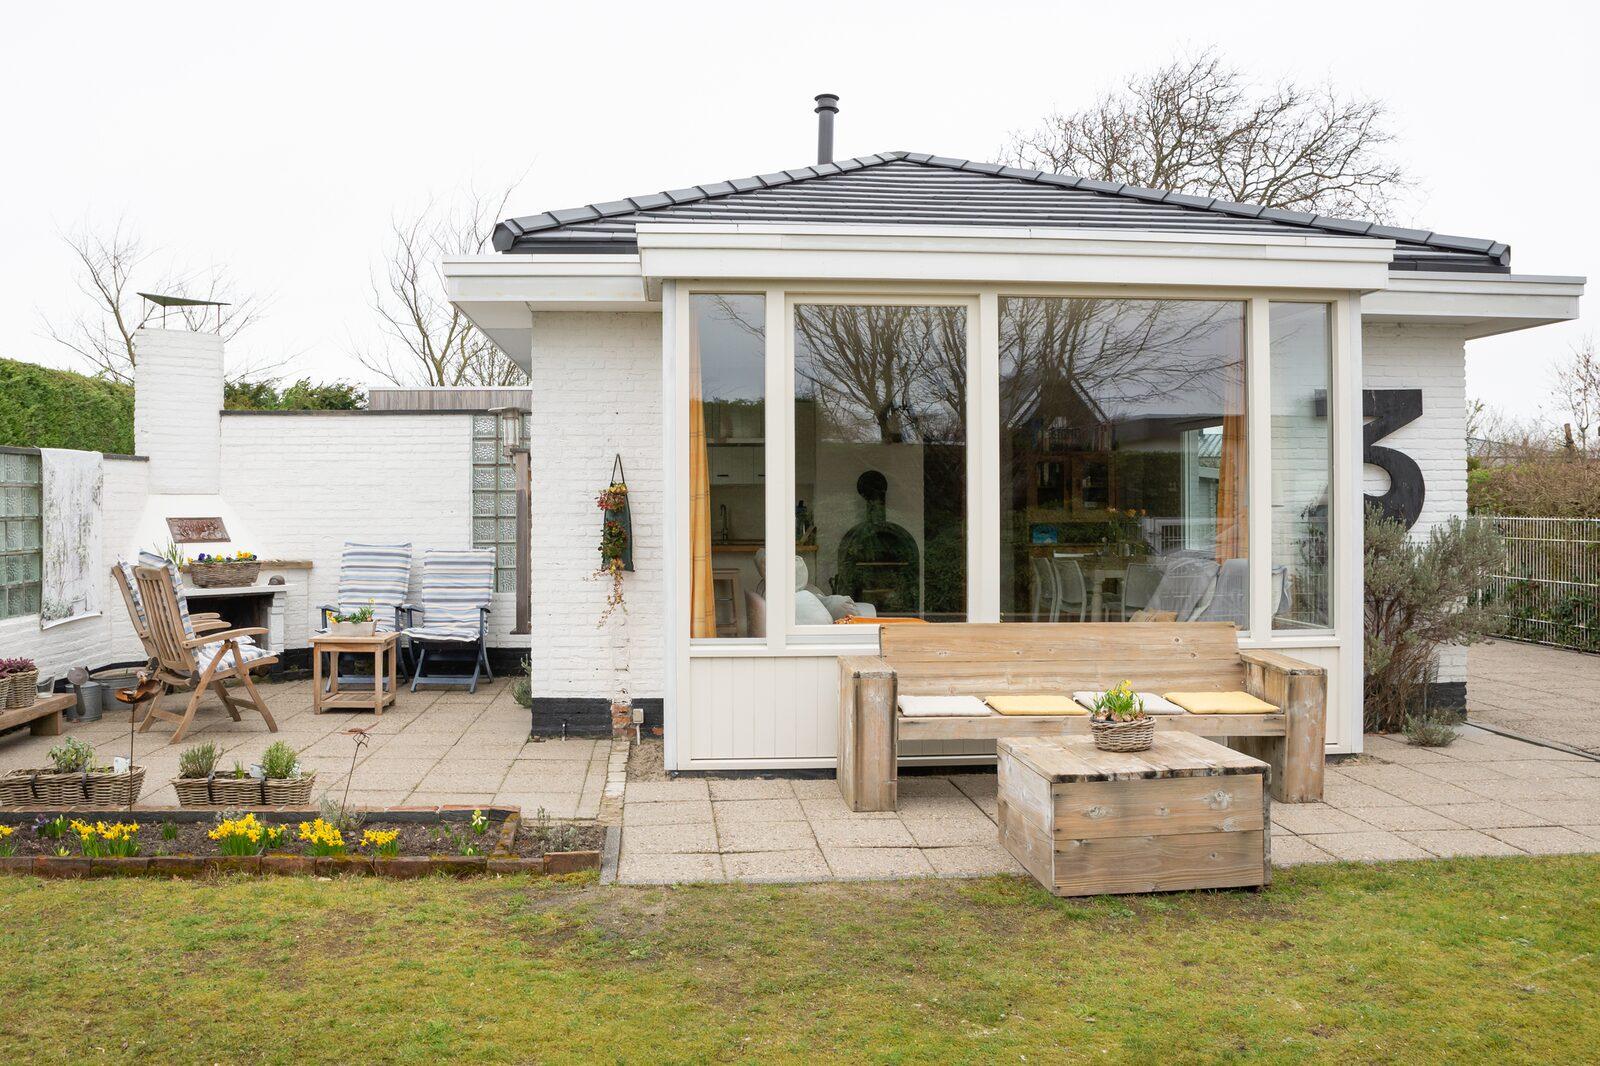 Ferienhaus - Horizon 3 | Renesse